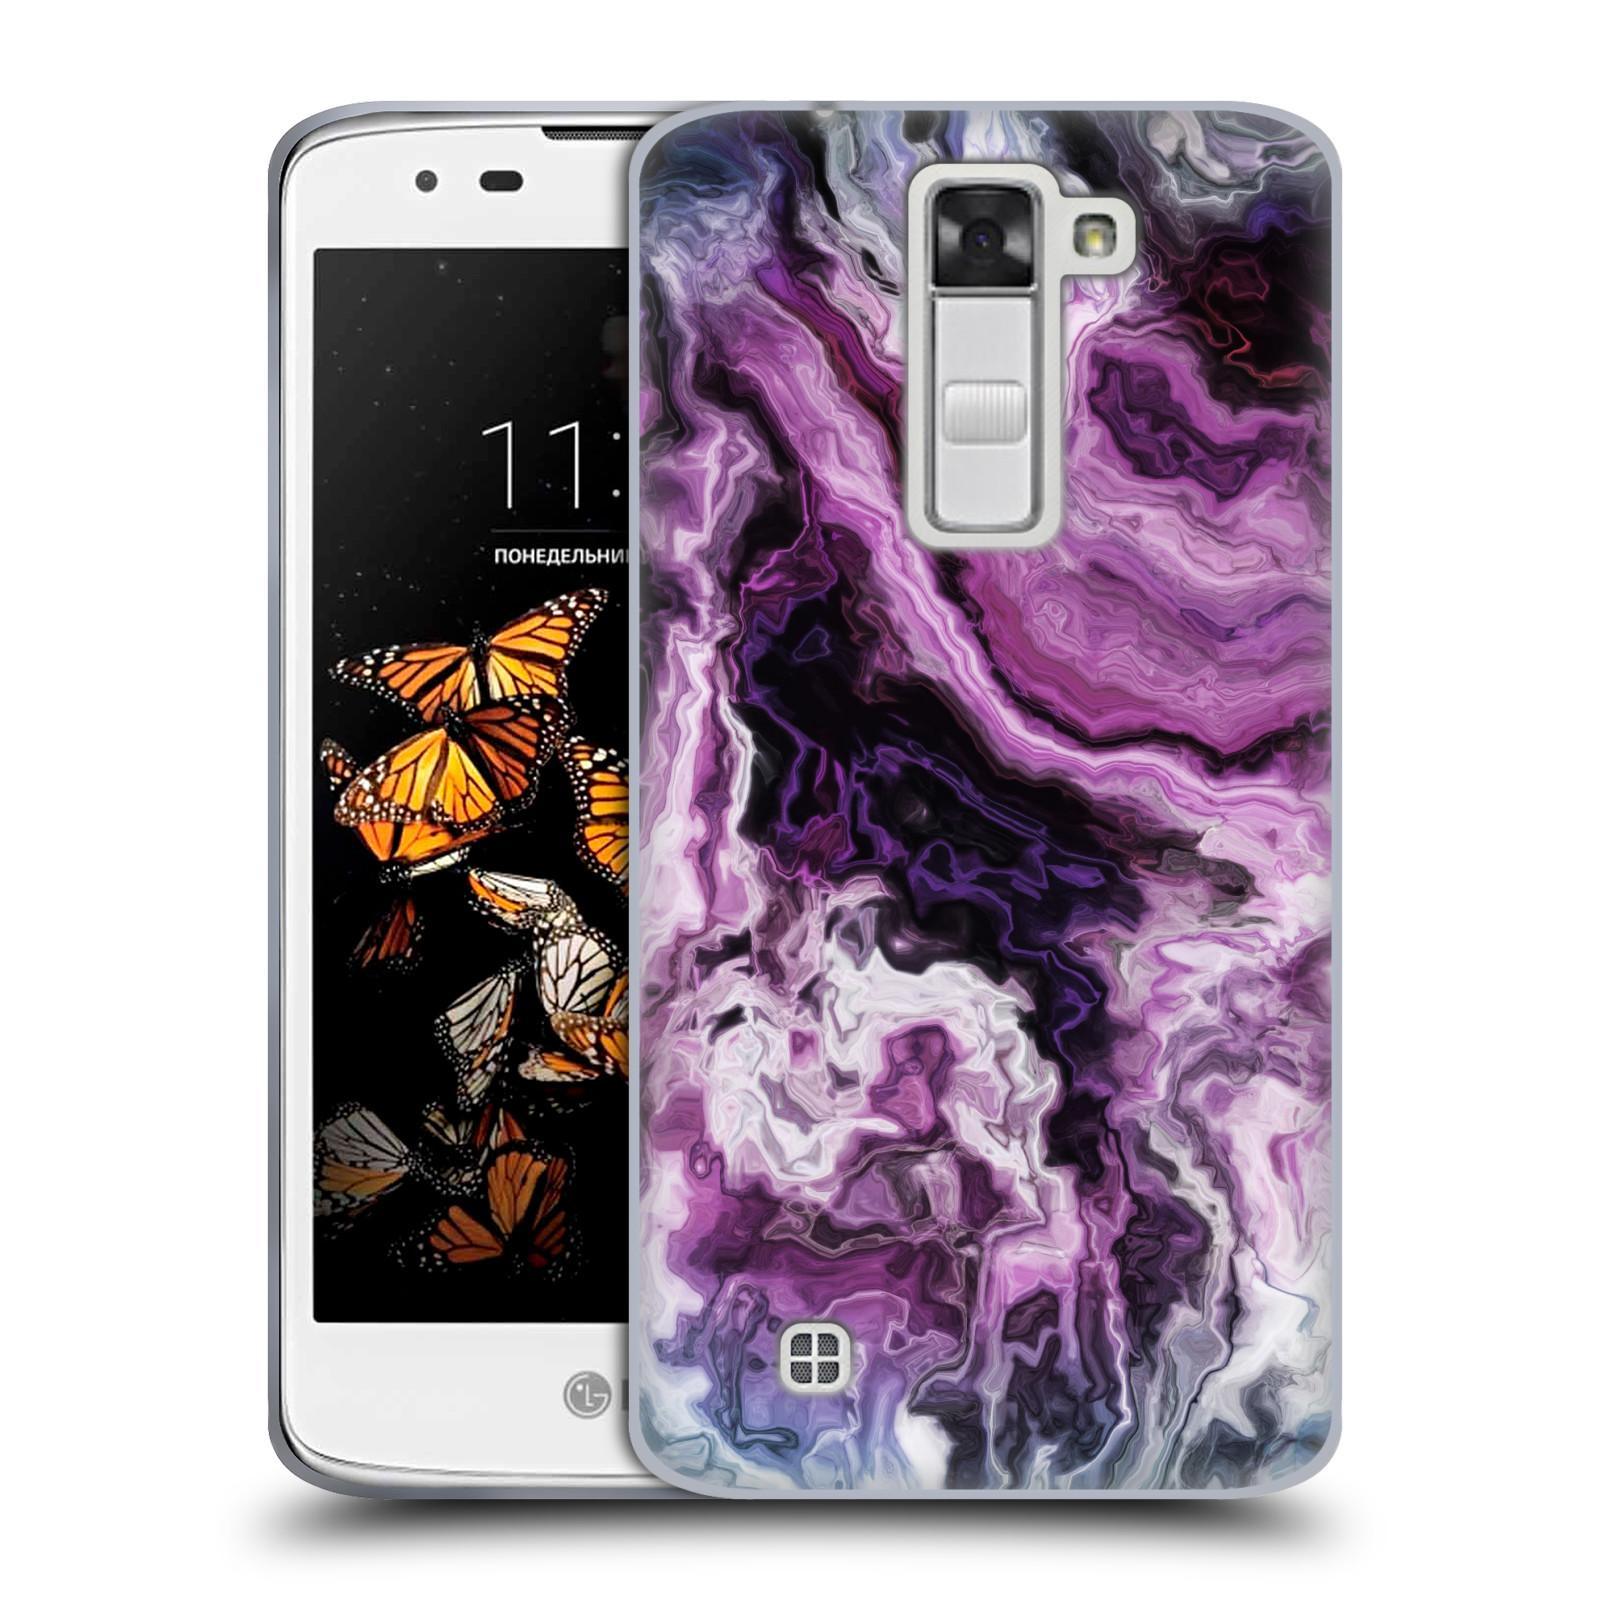 OFFICIAL-HAROULITA-MARBLE-2-SOFT-GEL-CASE-FOR-LG-PHONES-2